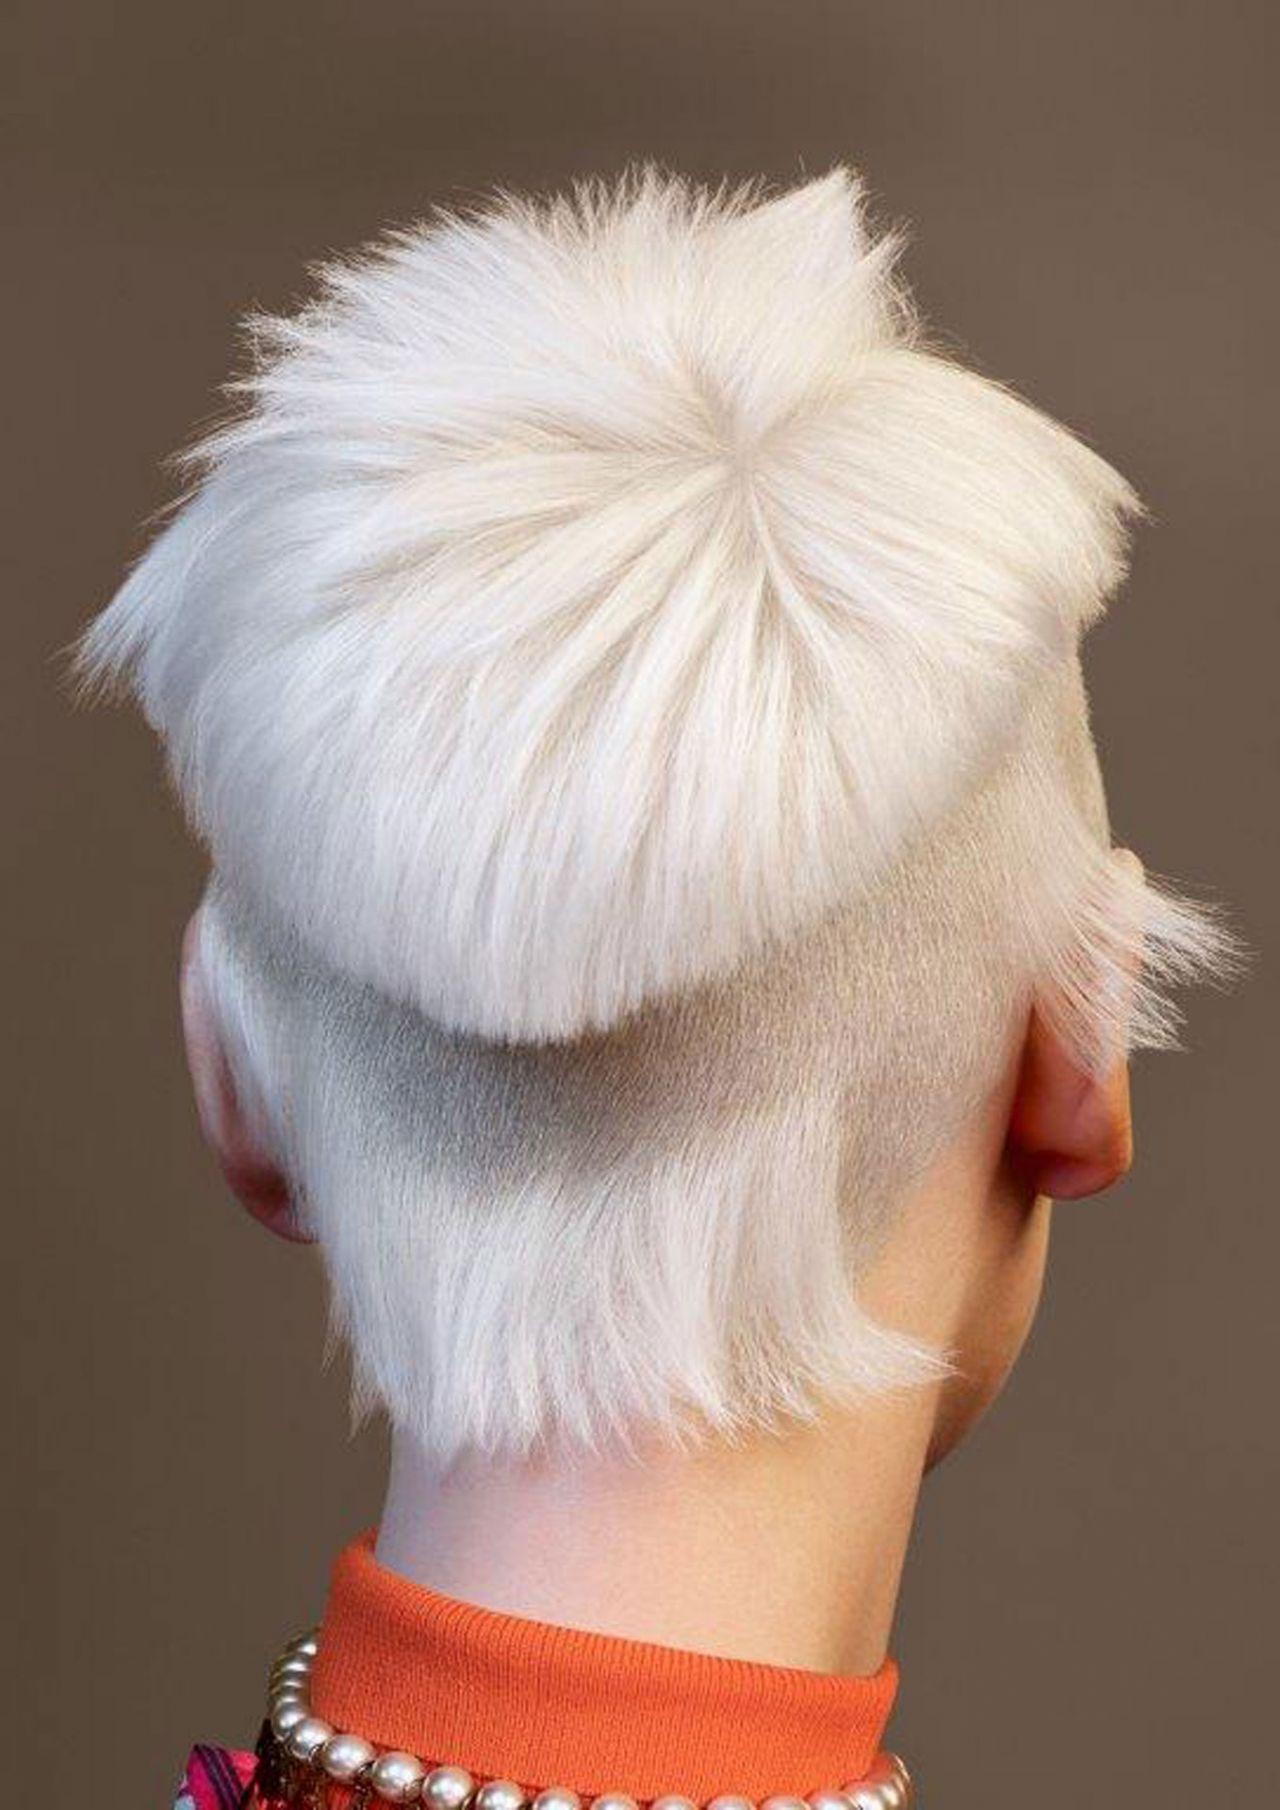 Undercut Damen Hinterkopf Muster - trends frisuren